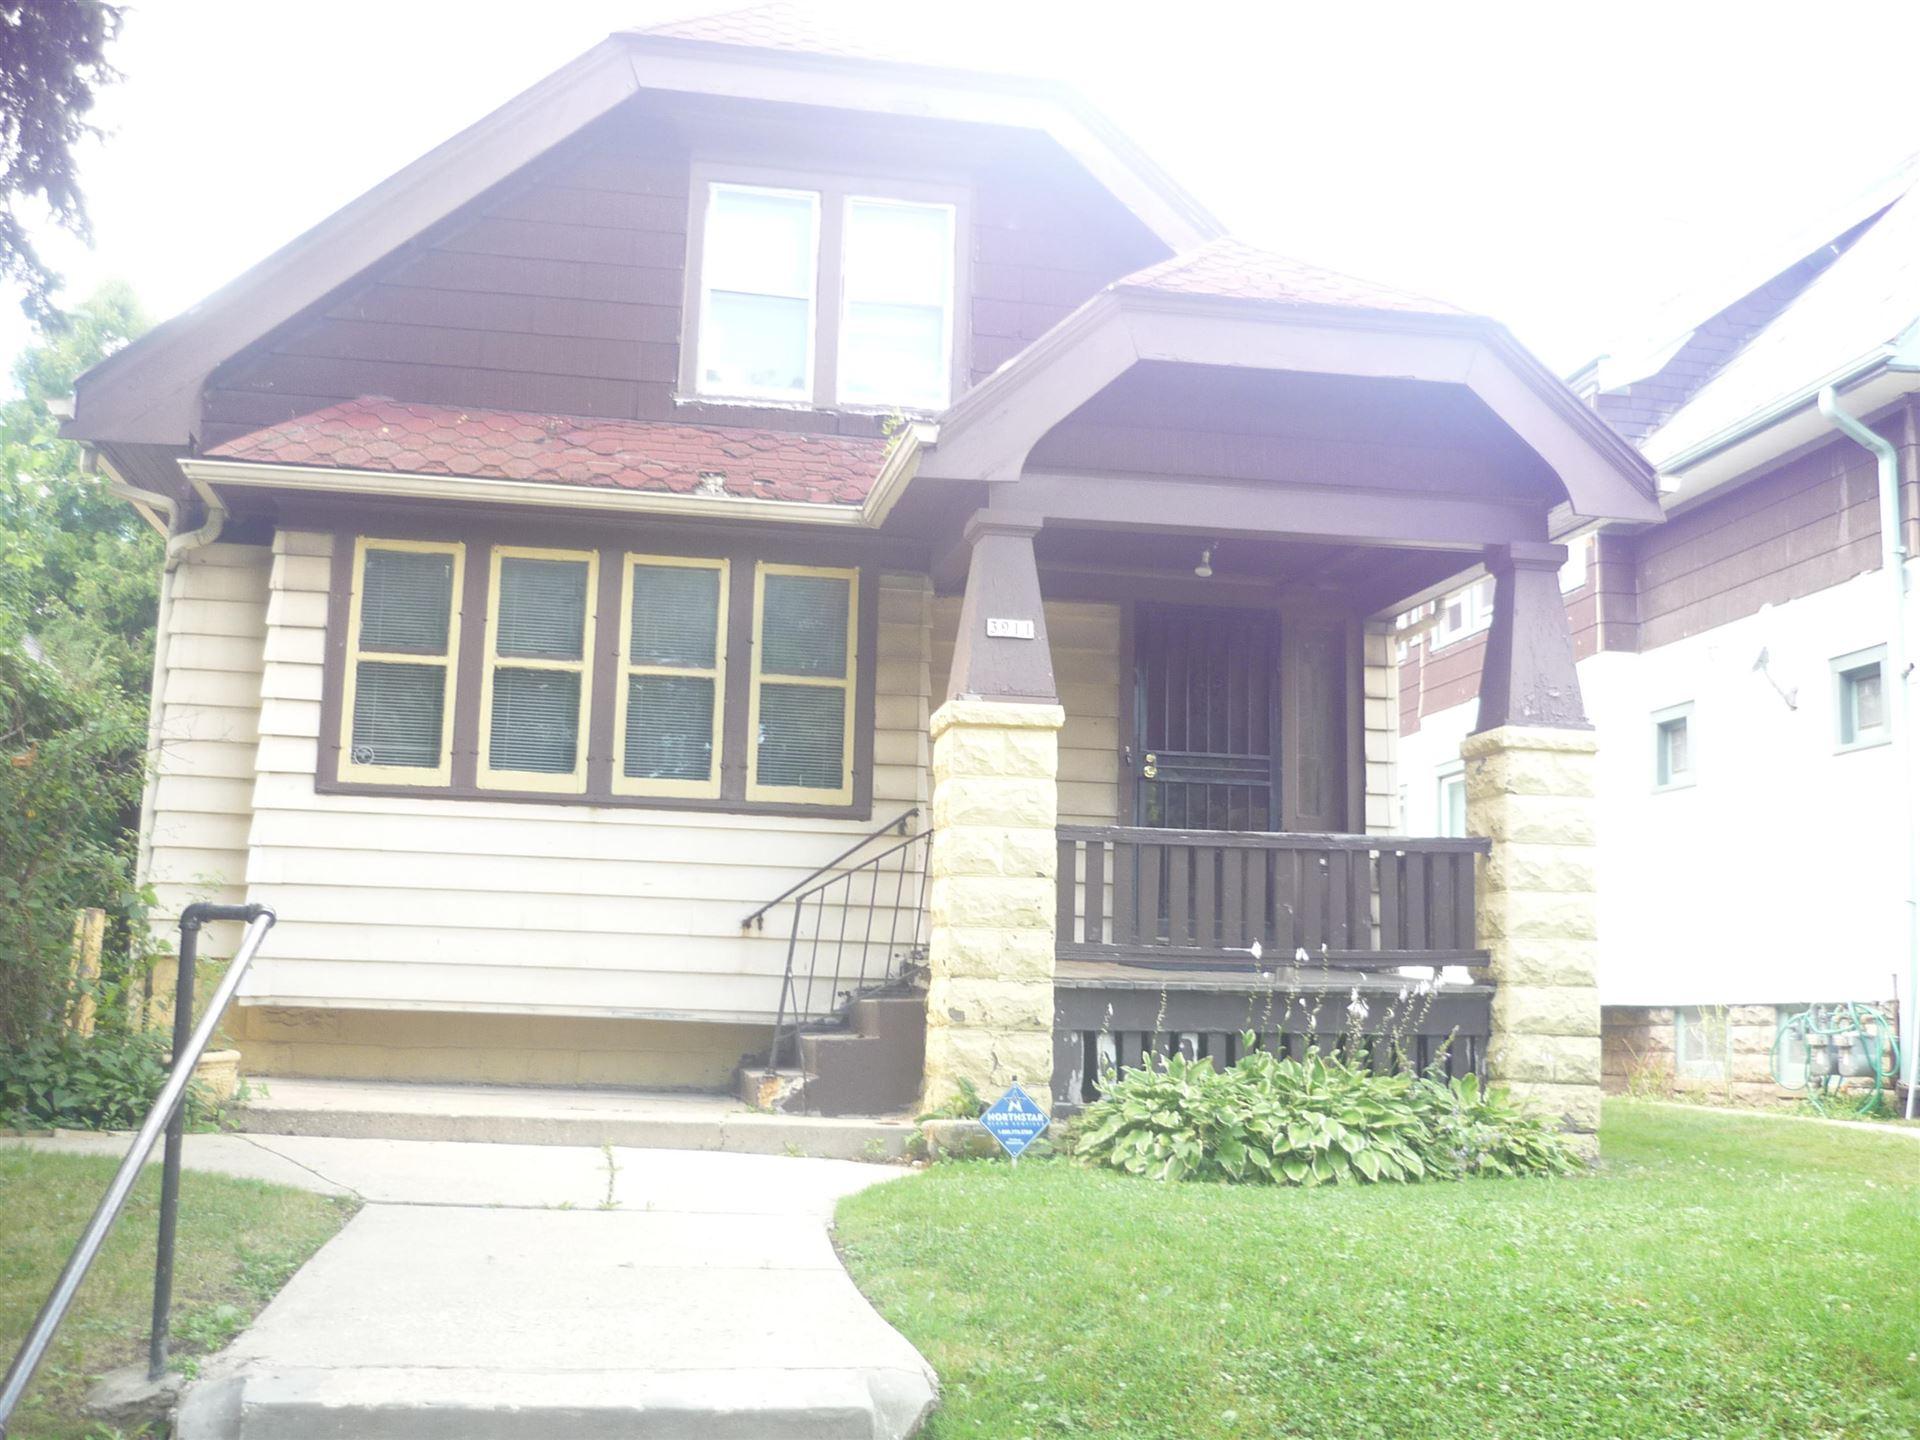 3911 N 24th St, Milwaukee, WI 53206 - #: 1703789